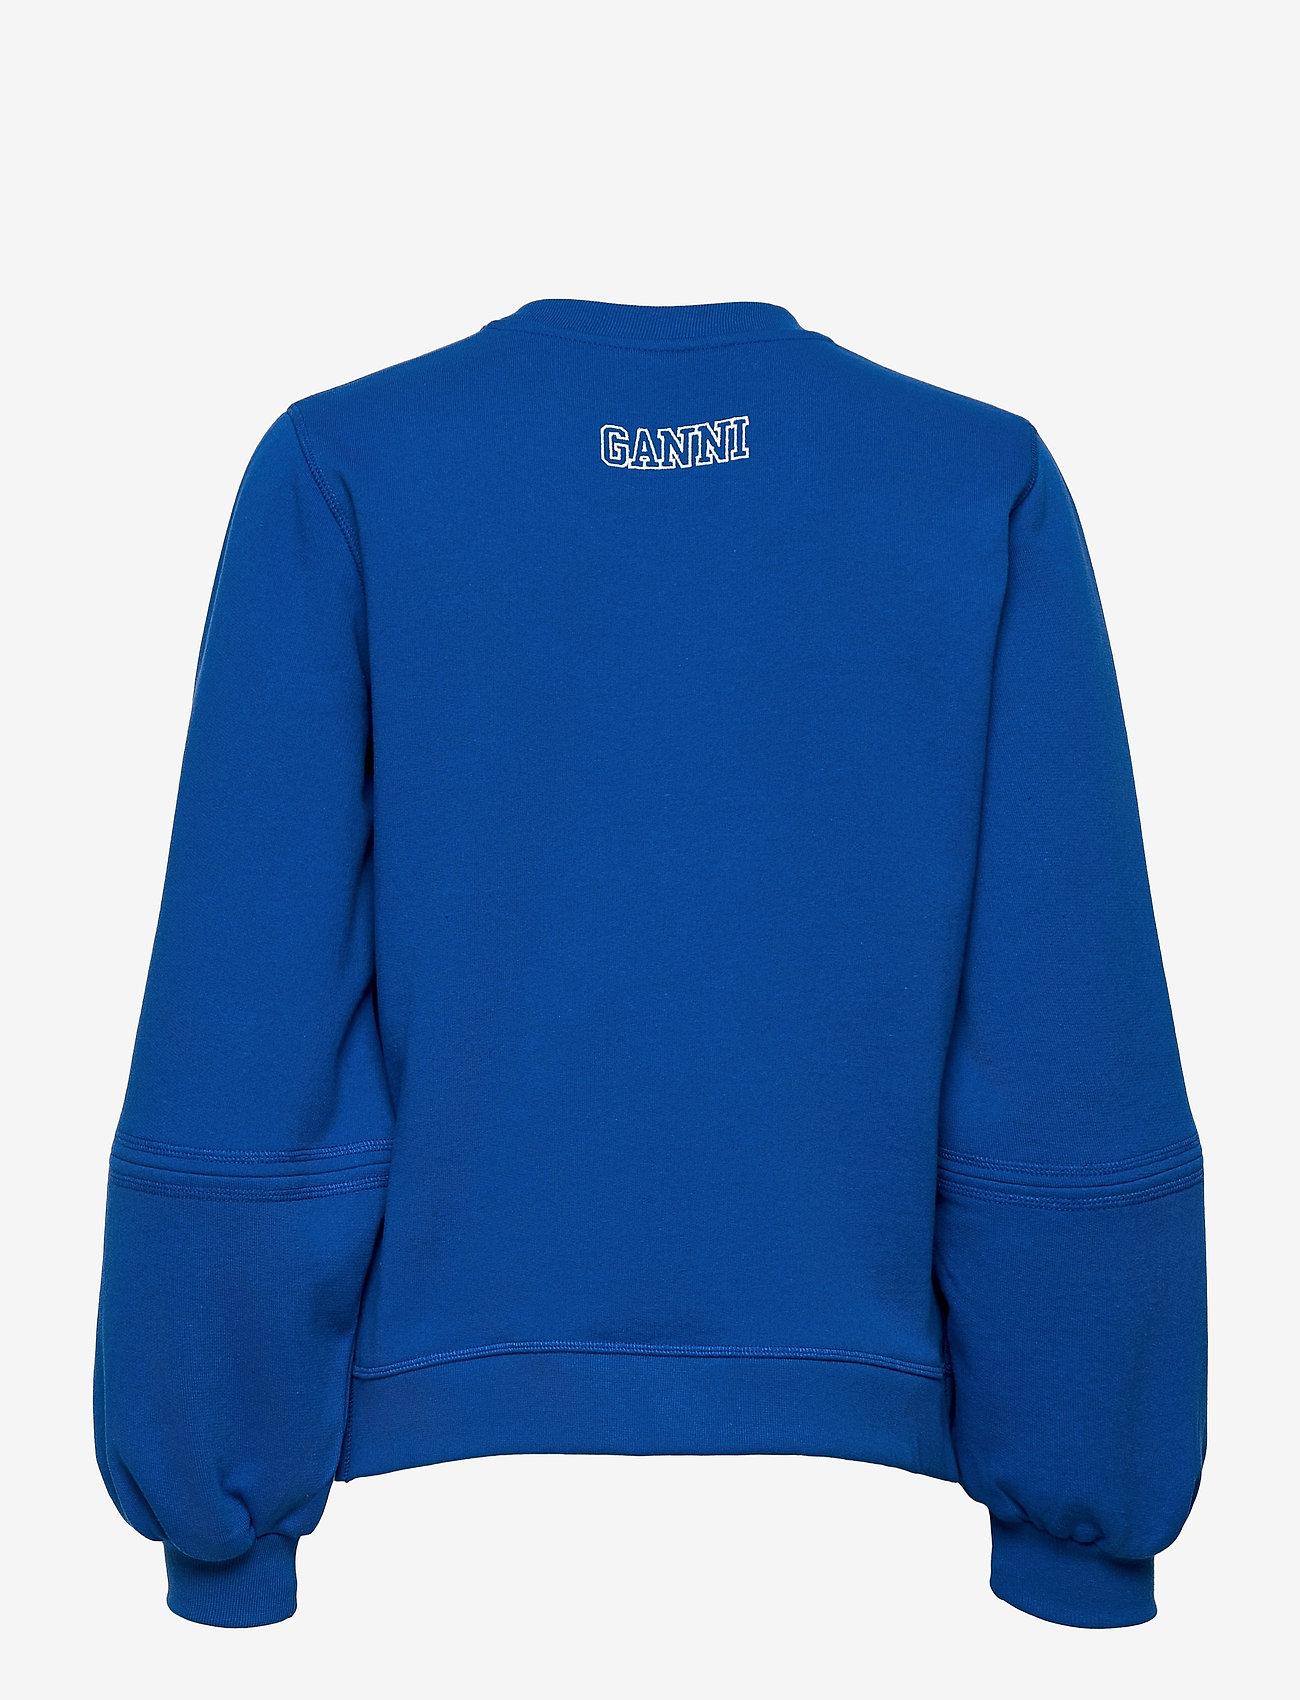 Ganni - Software Isoli - sweatshirts & hoodies - daphne - 1